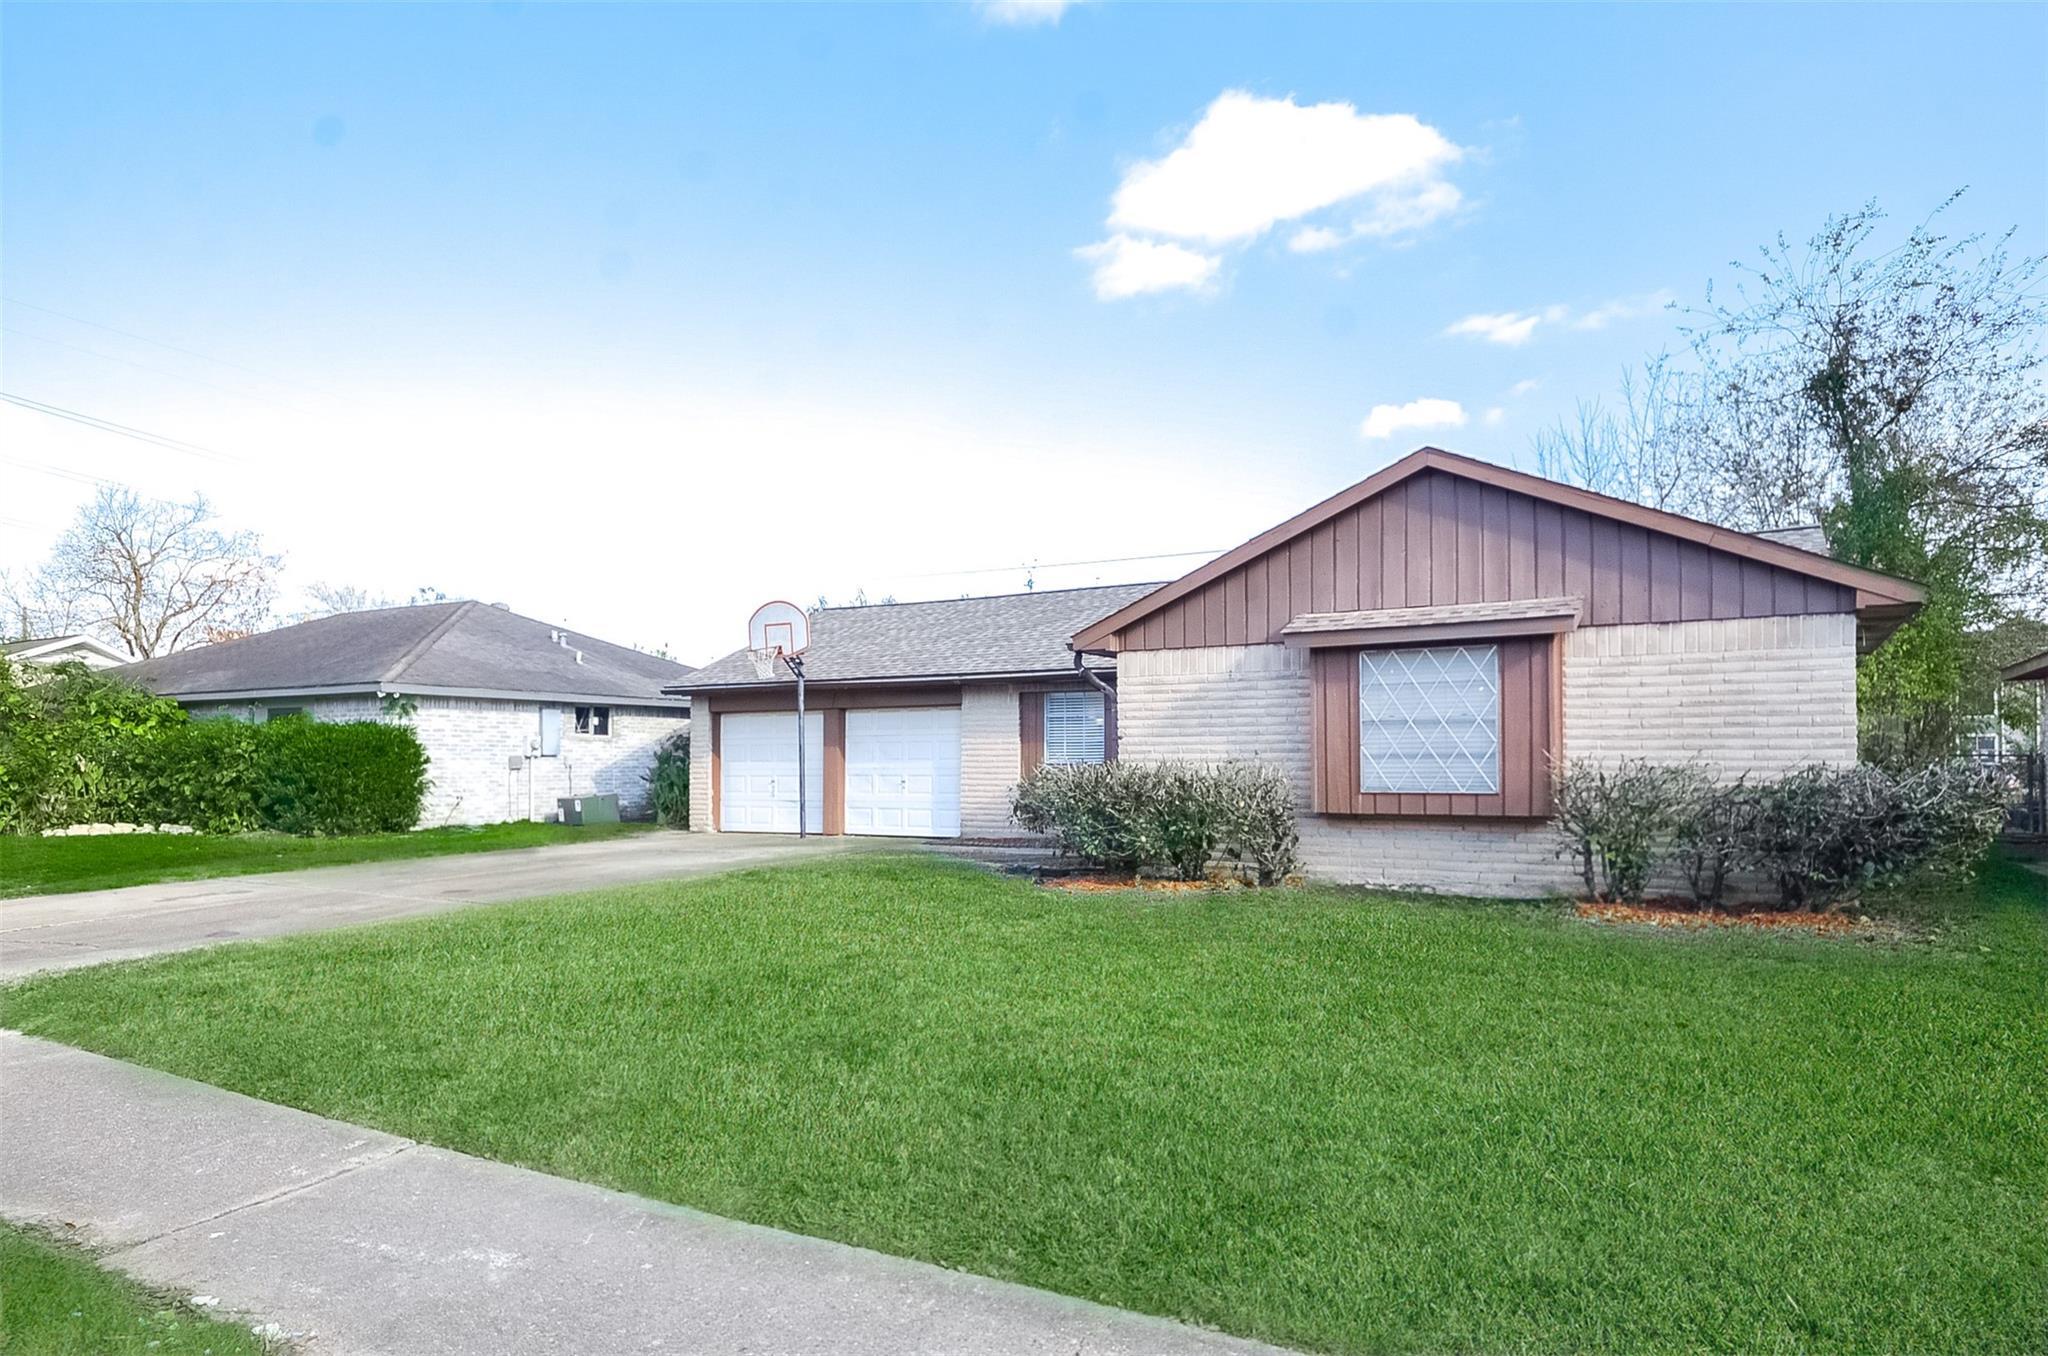 10119 Leawood Blvd Property Photo - Houston, TX real estate listing